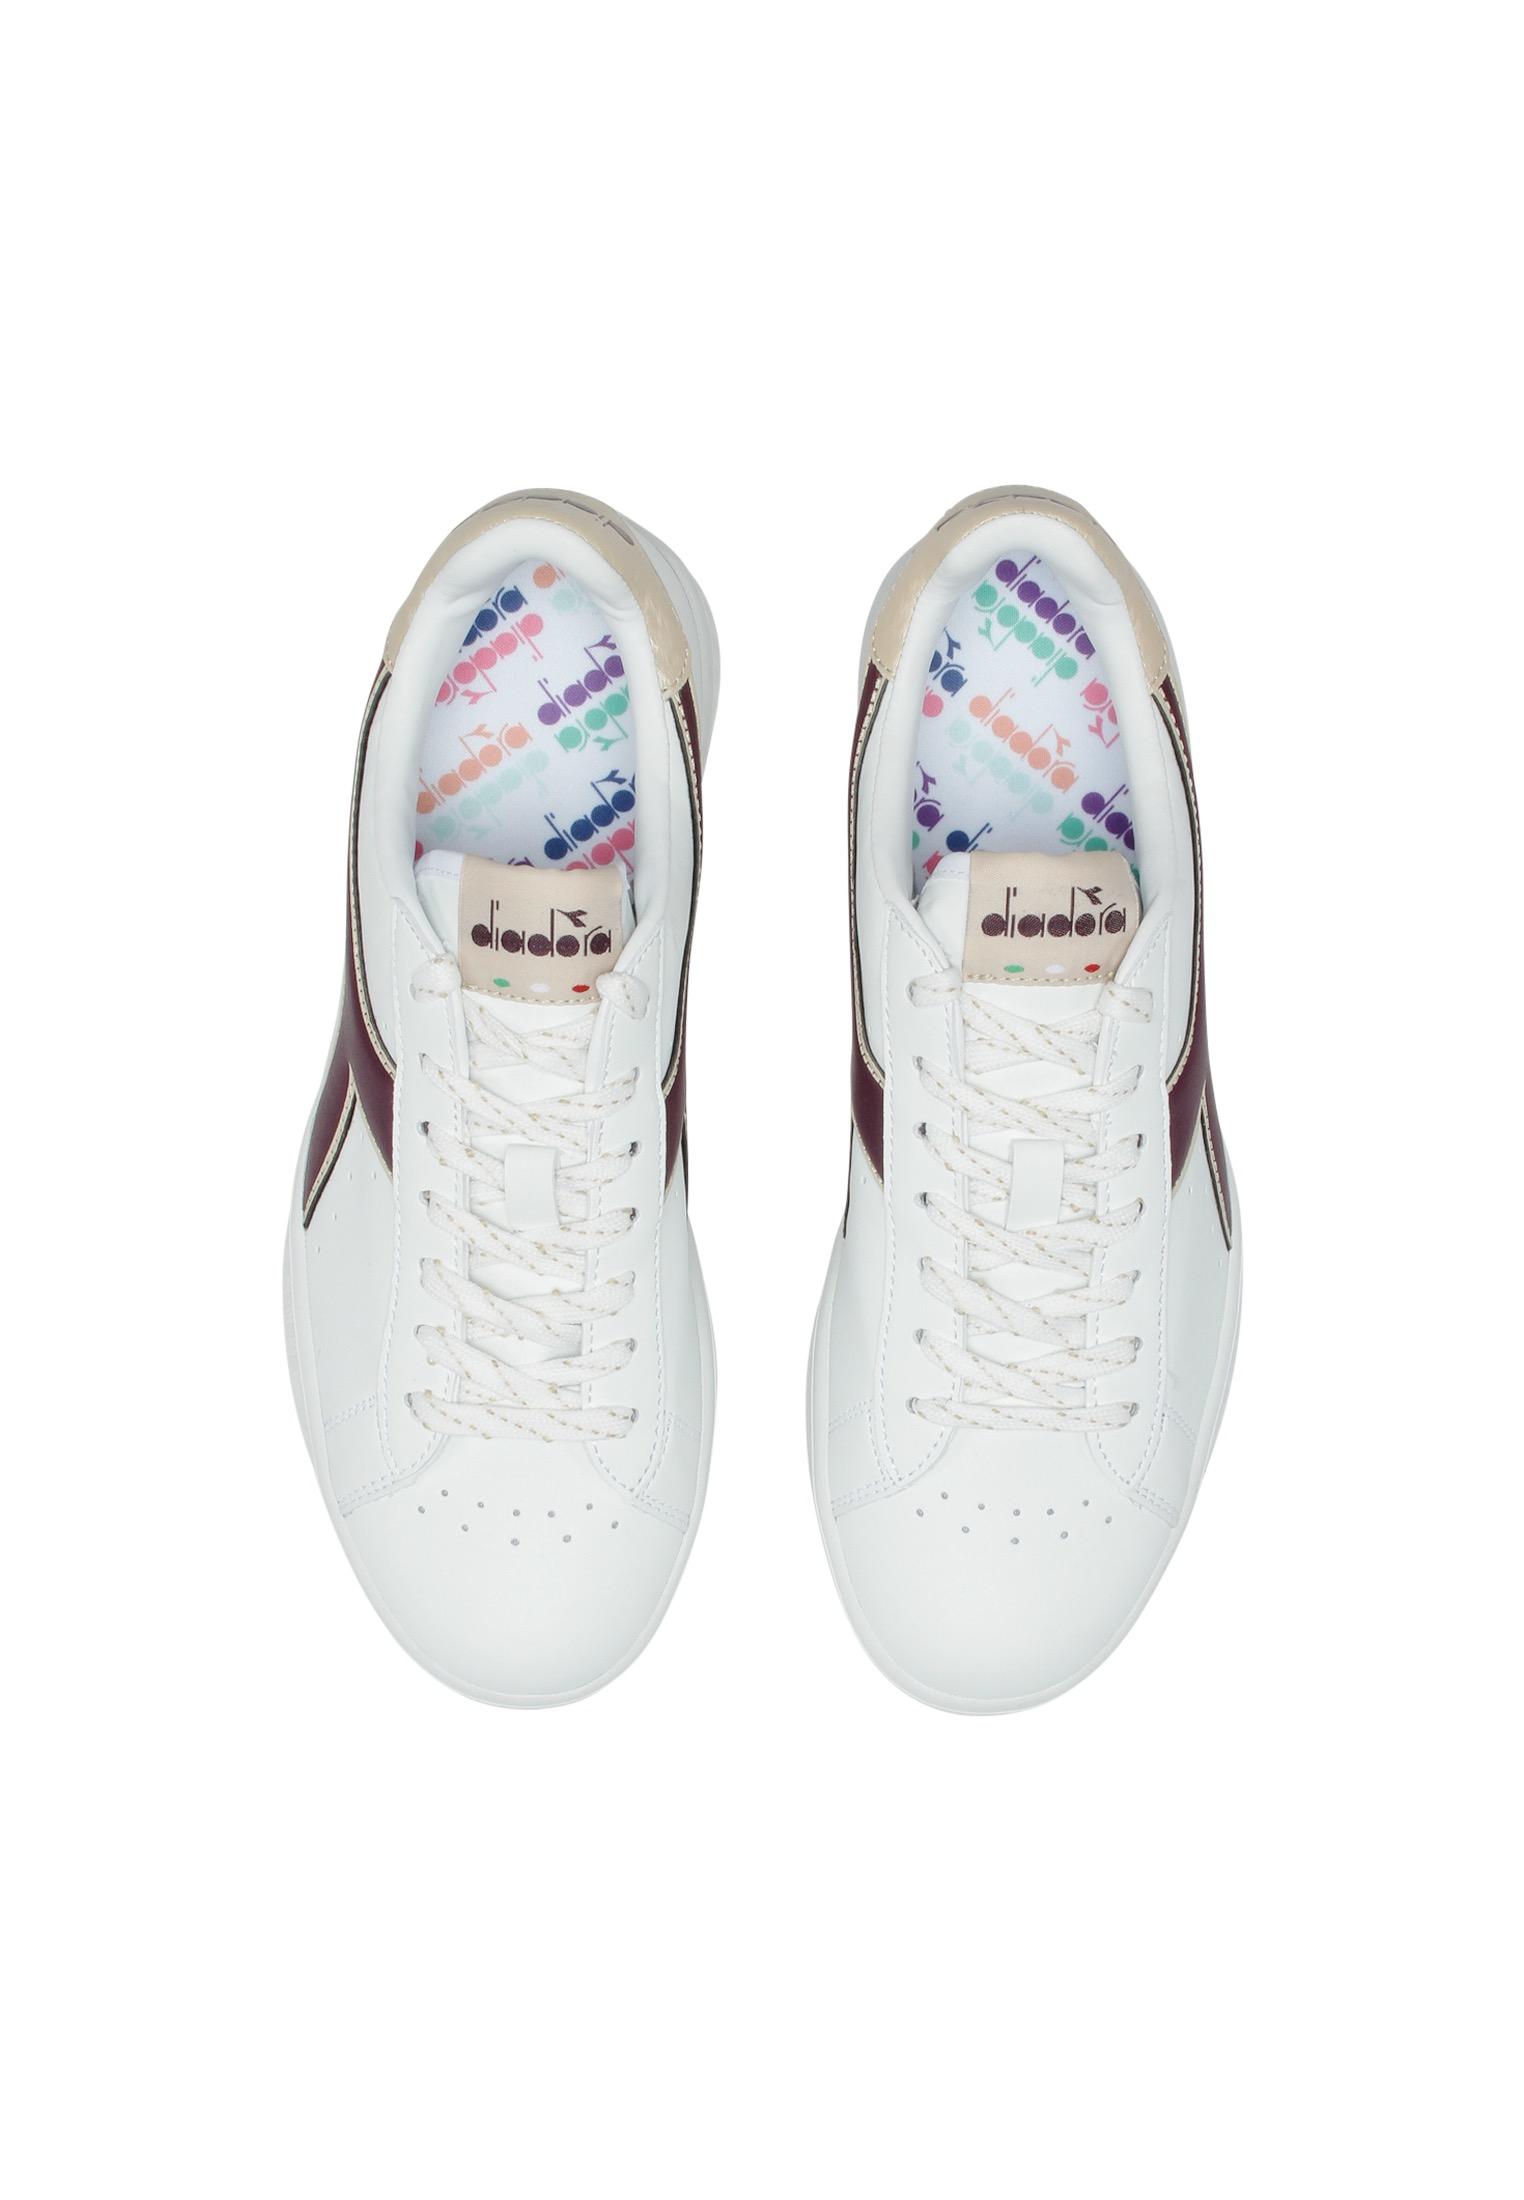 Diadora-Sneakers-GAME-P-WN-para-hombre-y-mujer miniatura 36